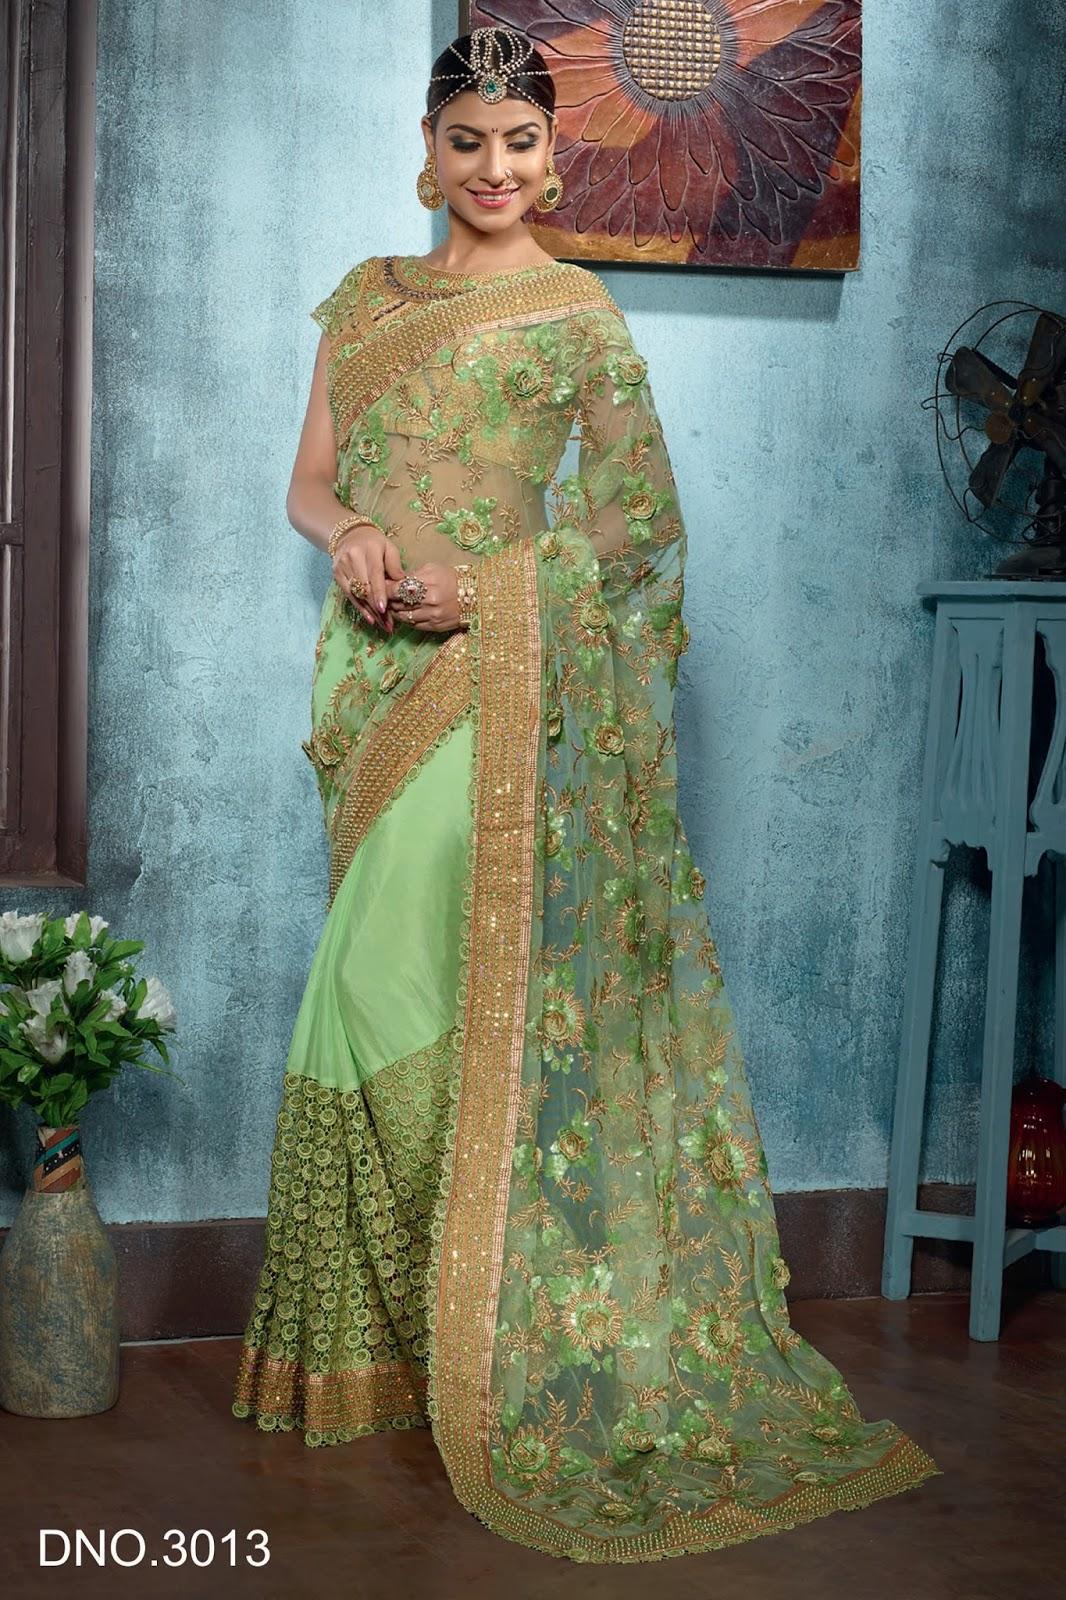 Suhagan - Heavy Embroidered Fancy Saree Online - Helix Enterprise ...